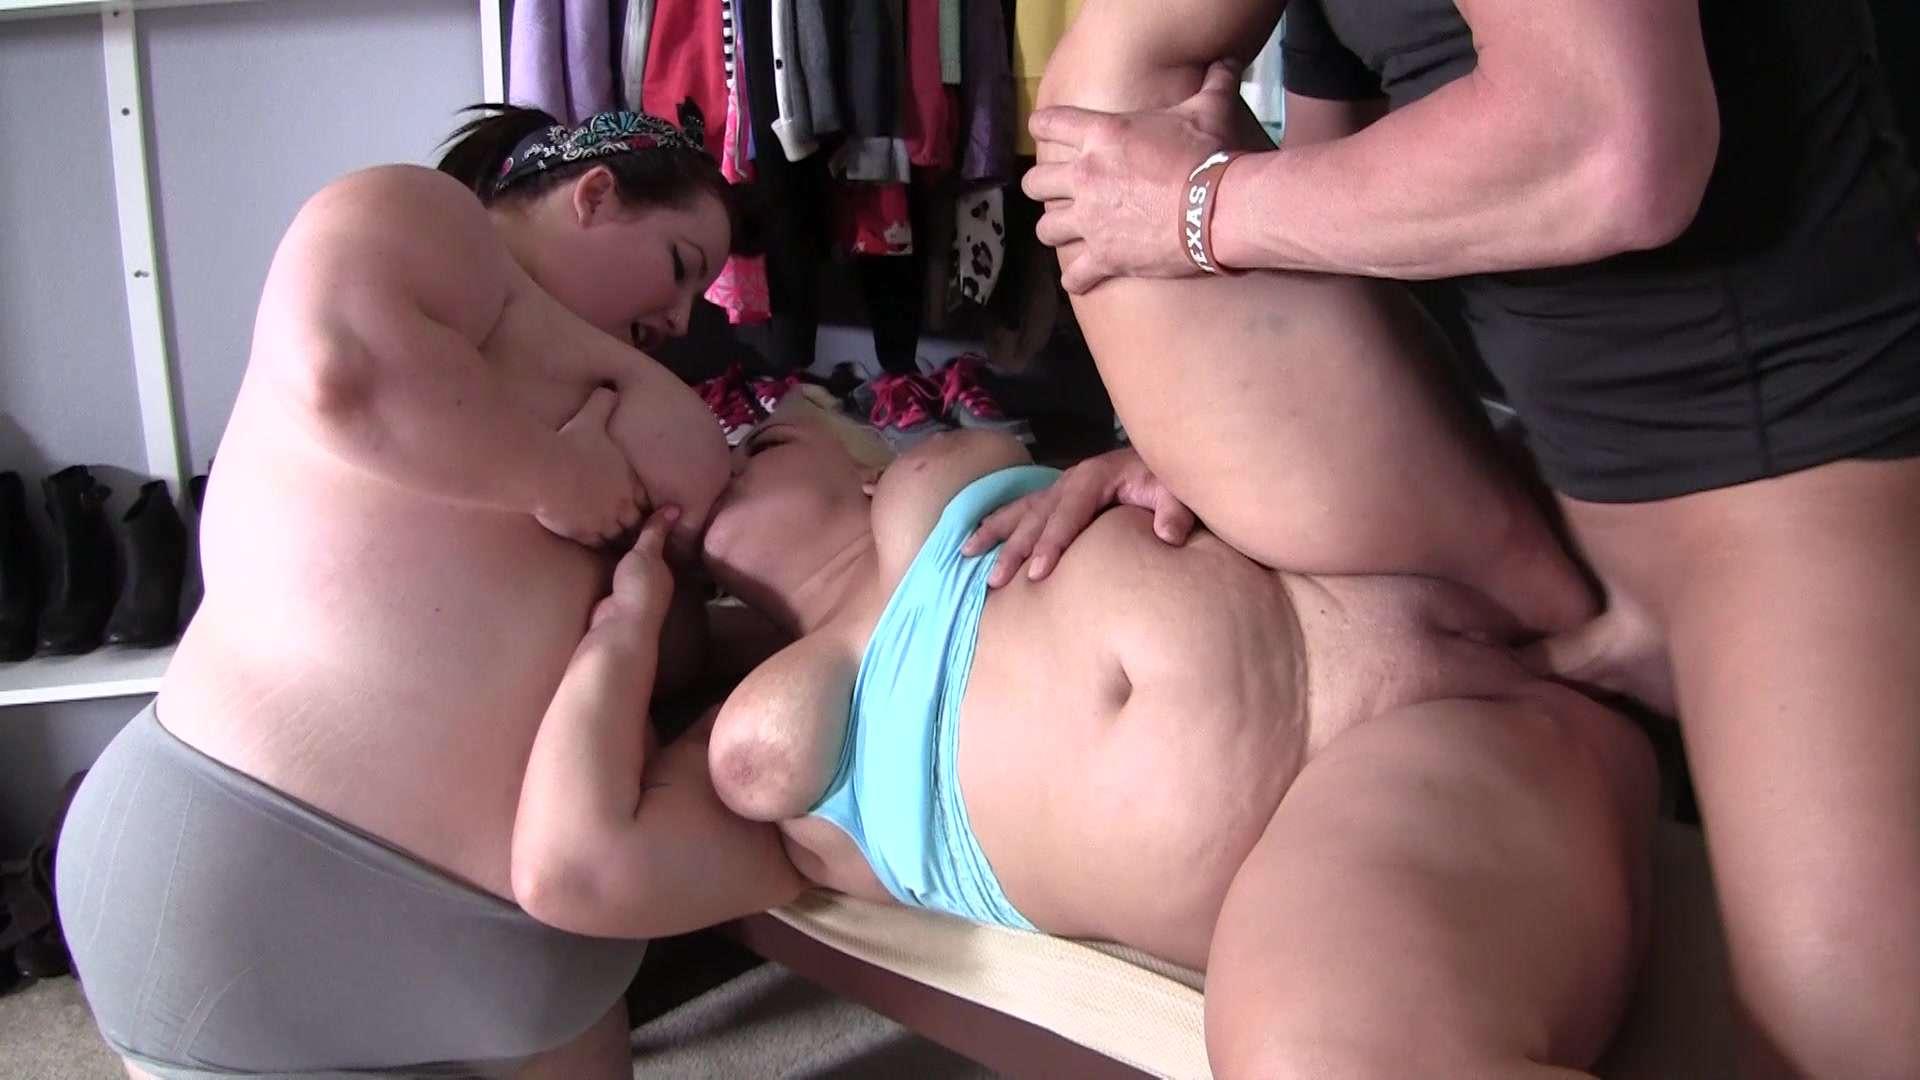 Bbw Threesome Porn Pics, Chubby Sex Galery